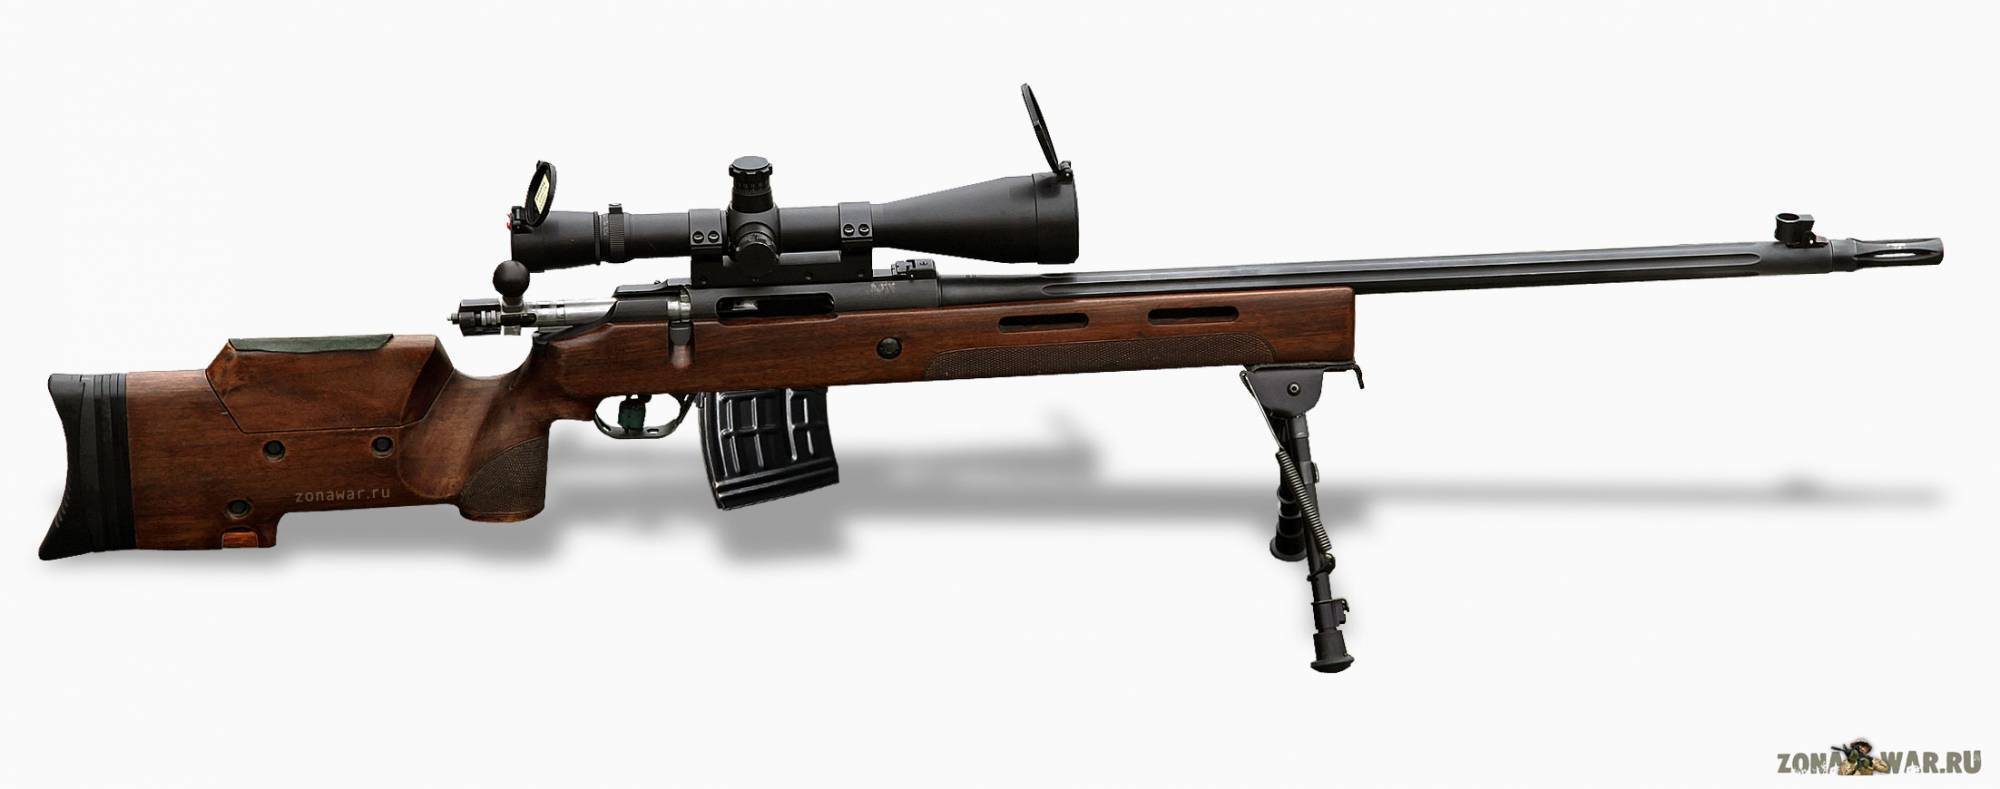 Tei m89-sr снайперская винтовка — характеристики, фото, ттх